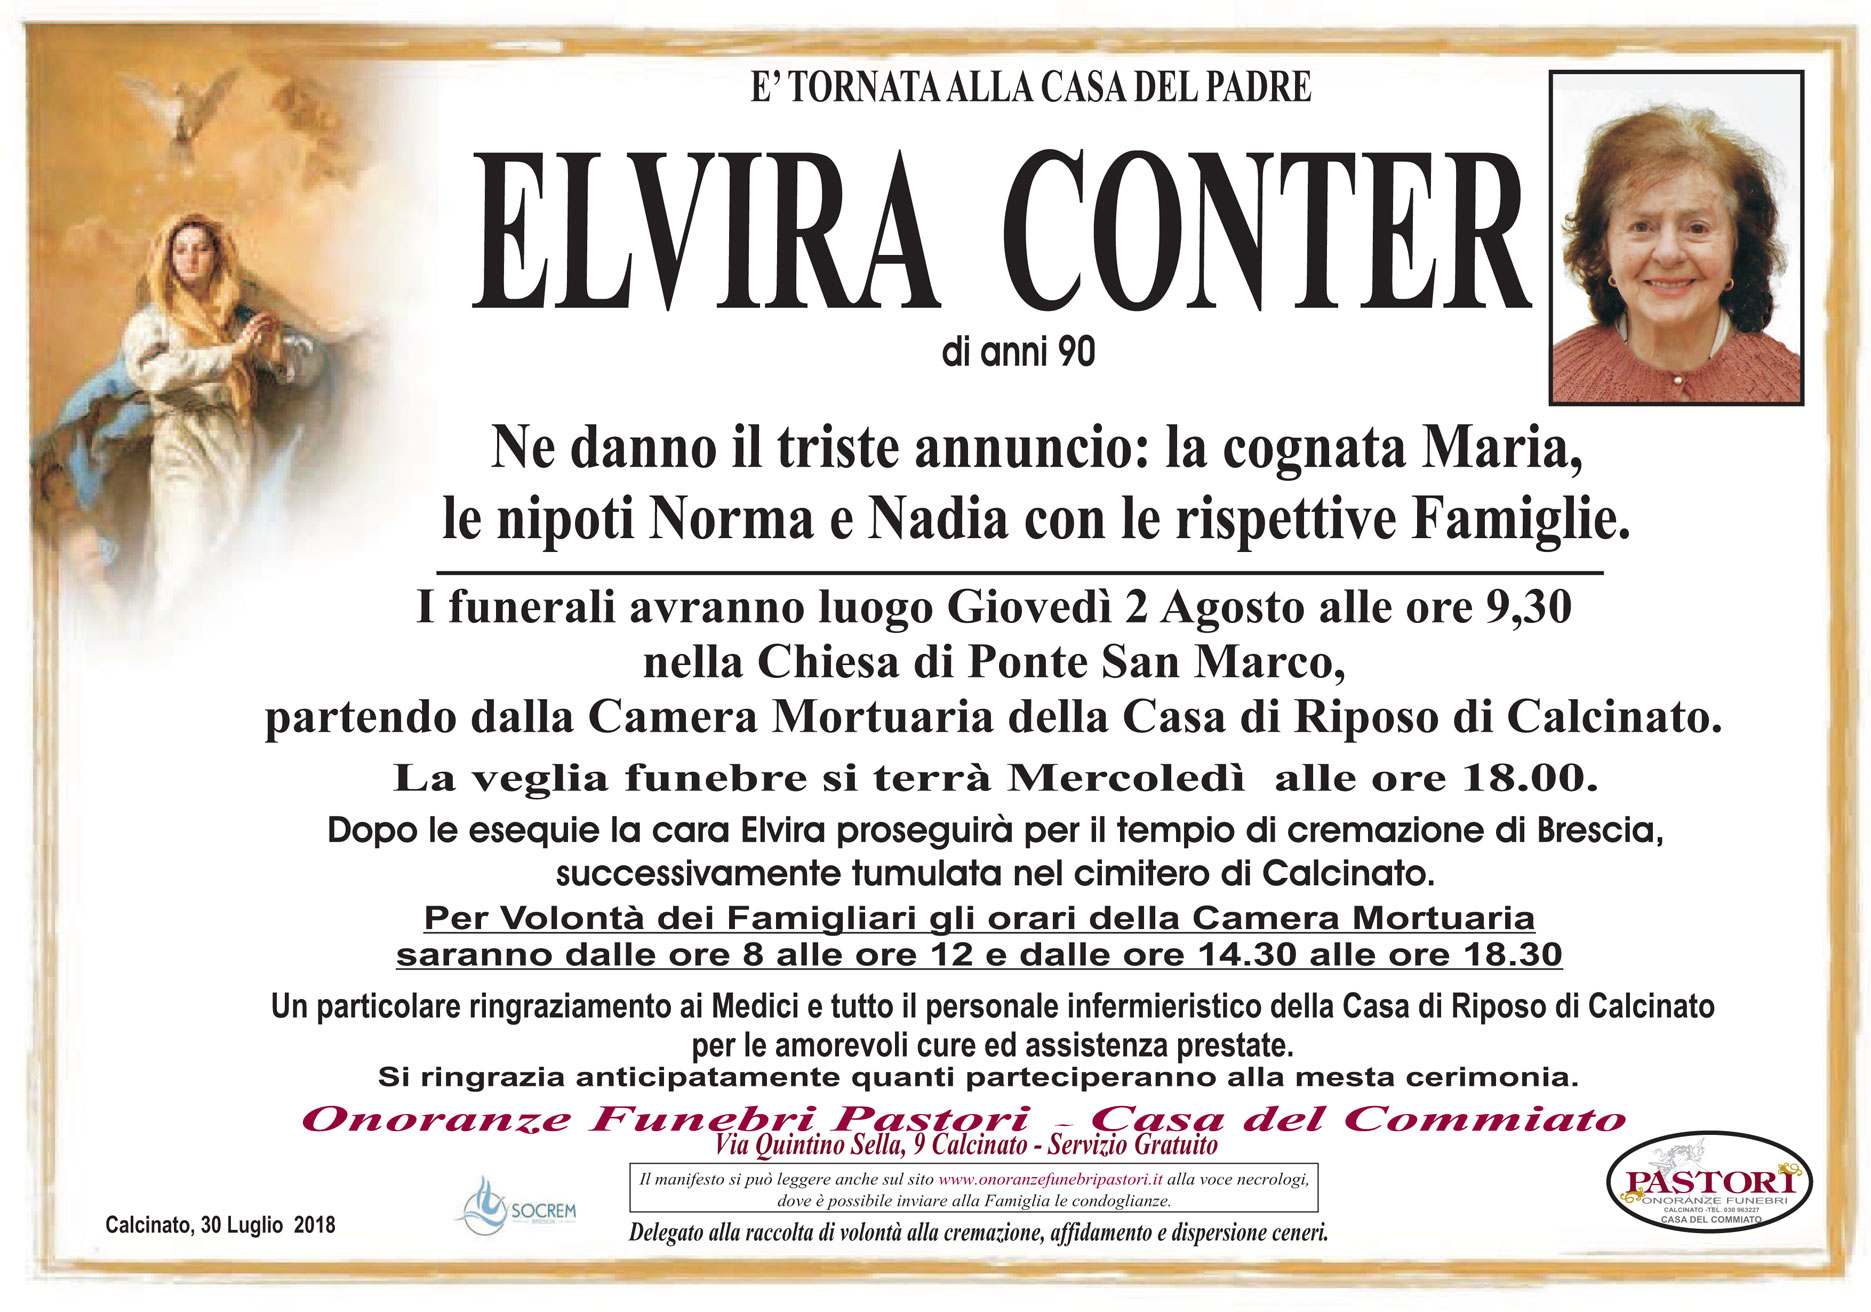 Elvira Conter